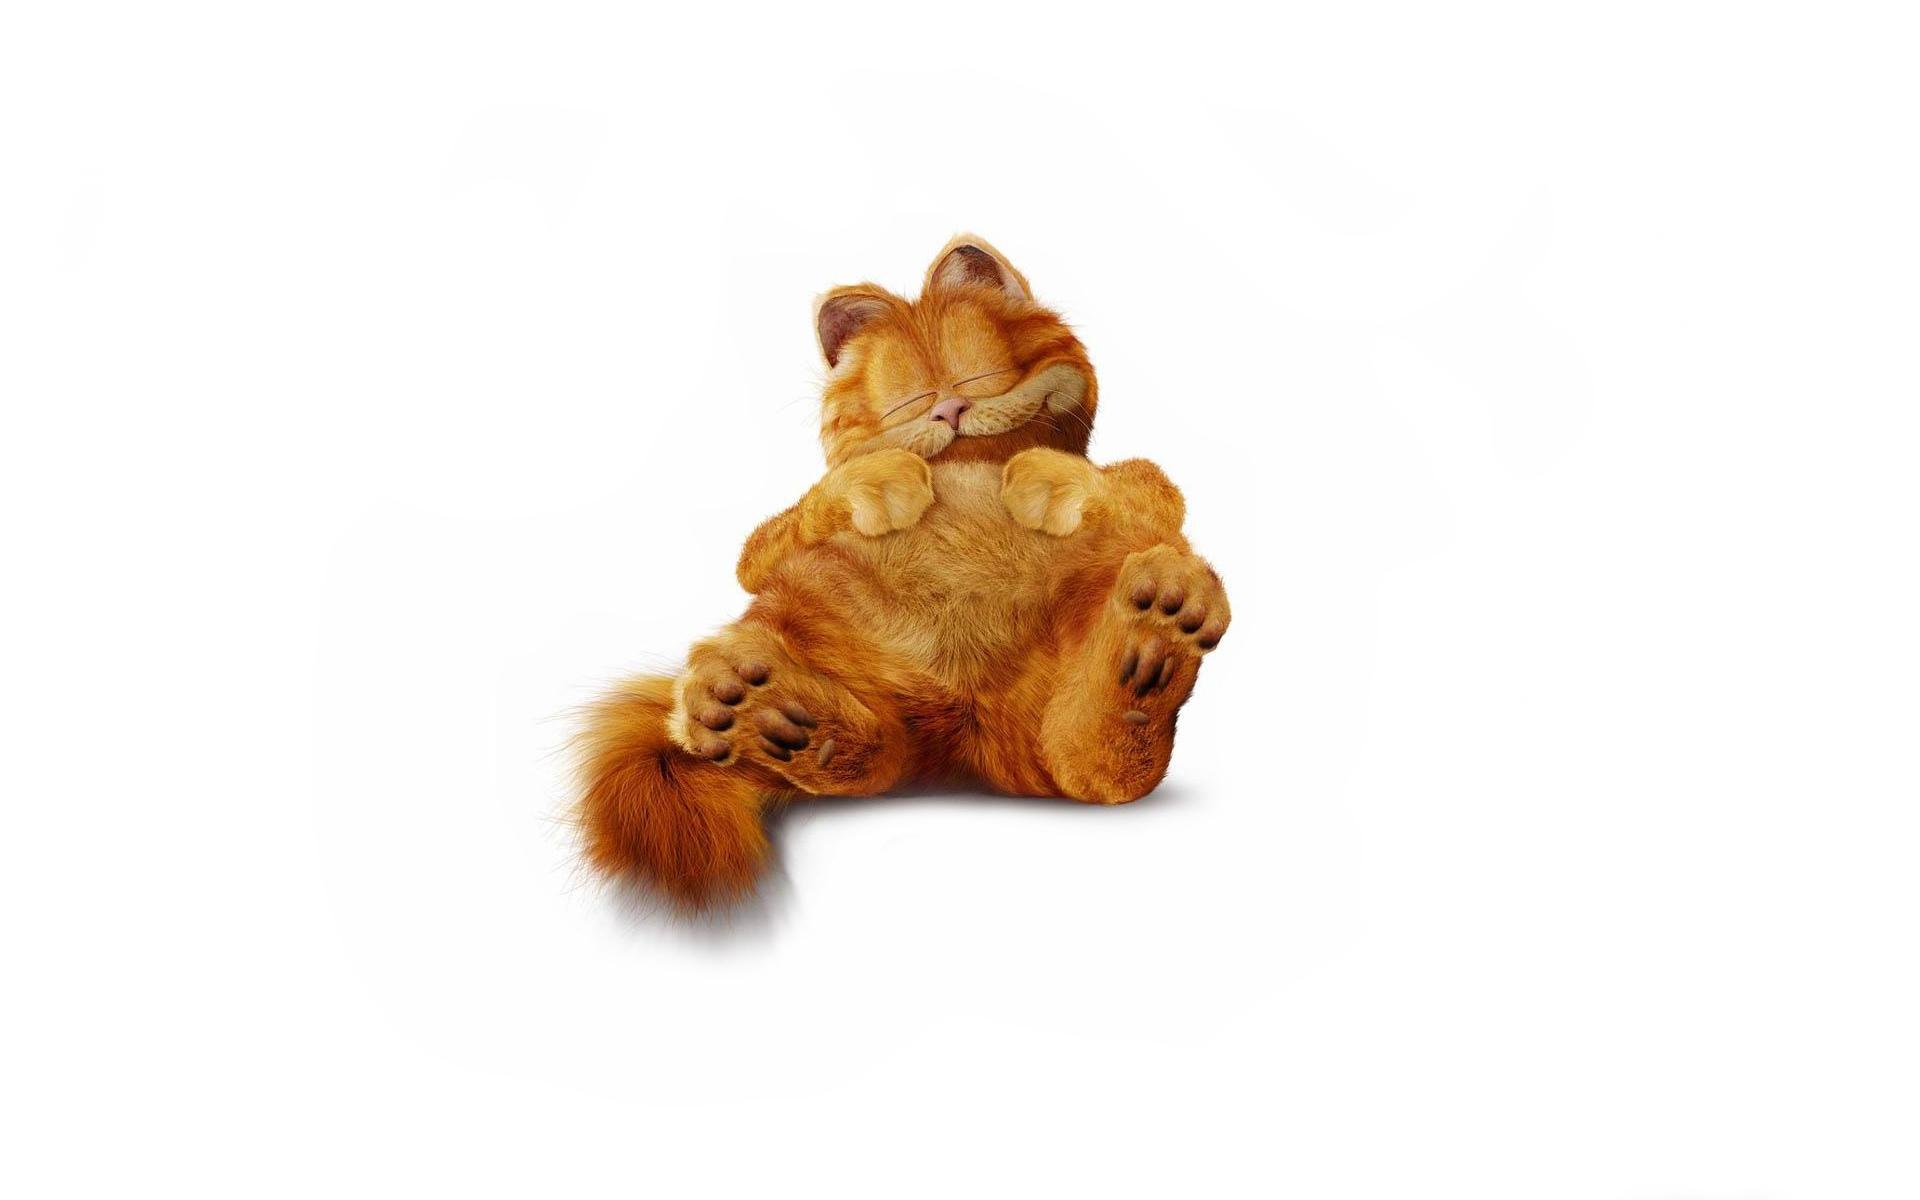 Garfield Furry Cat Minimalist Wallpaper 1920x1200 69494 Wallpaperup